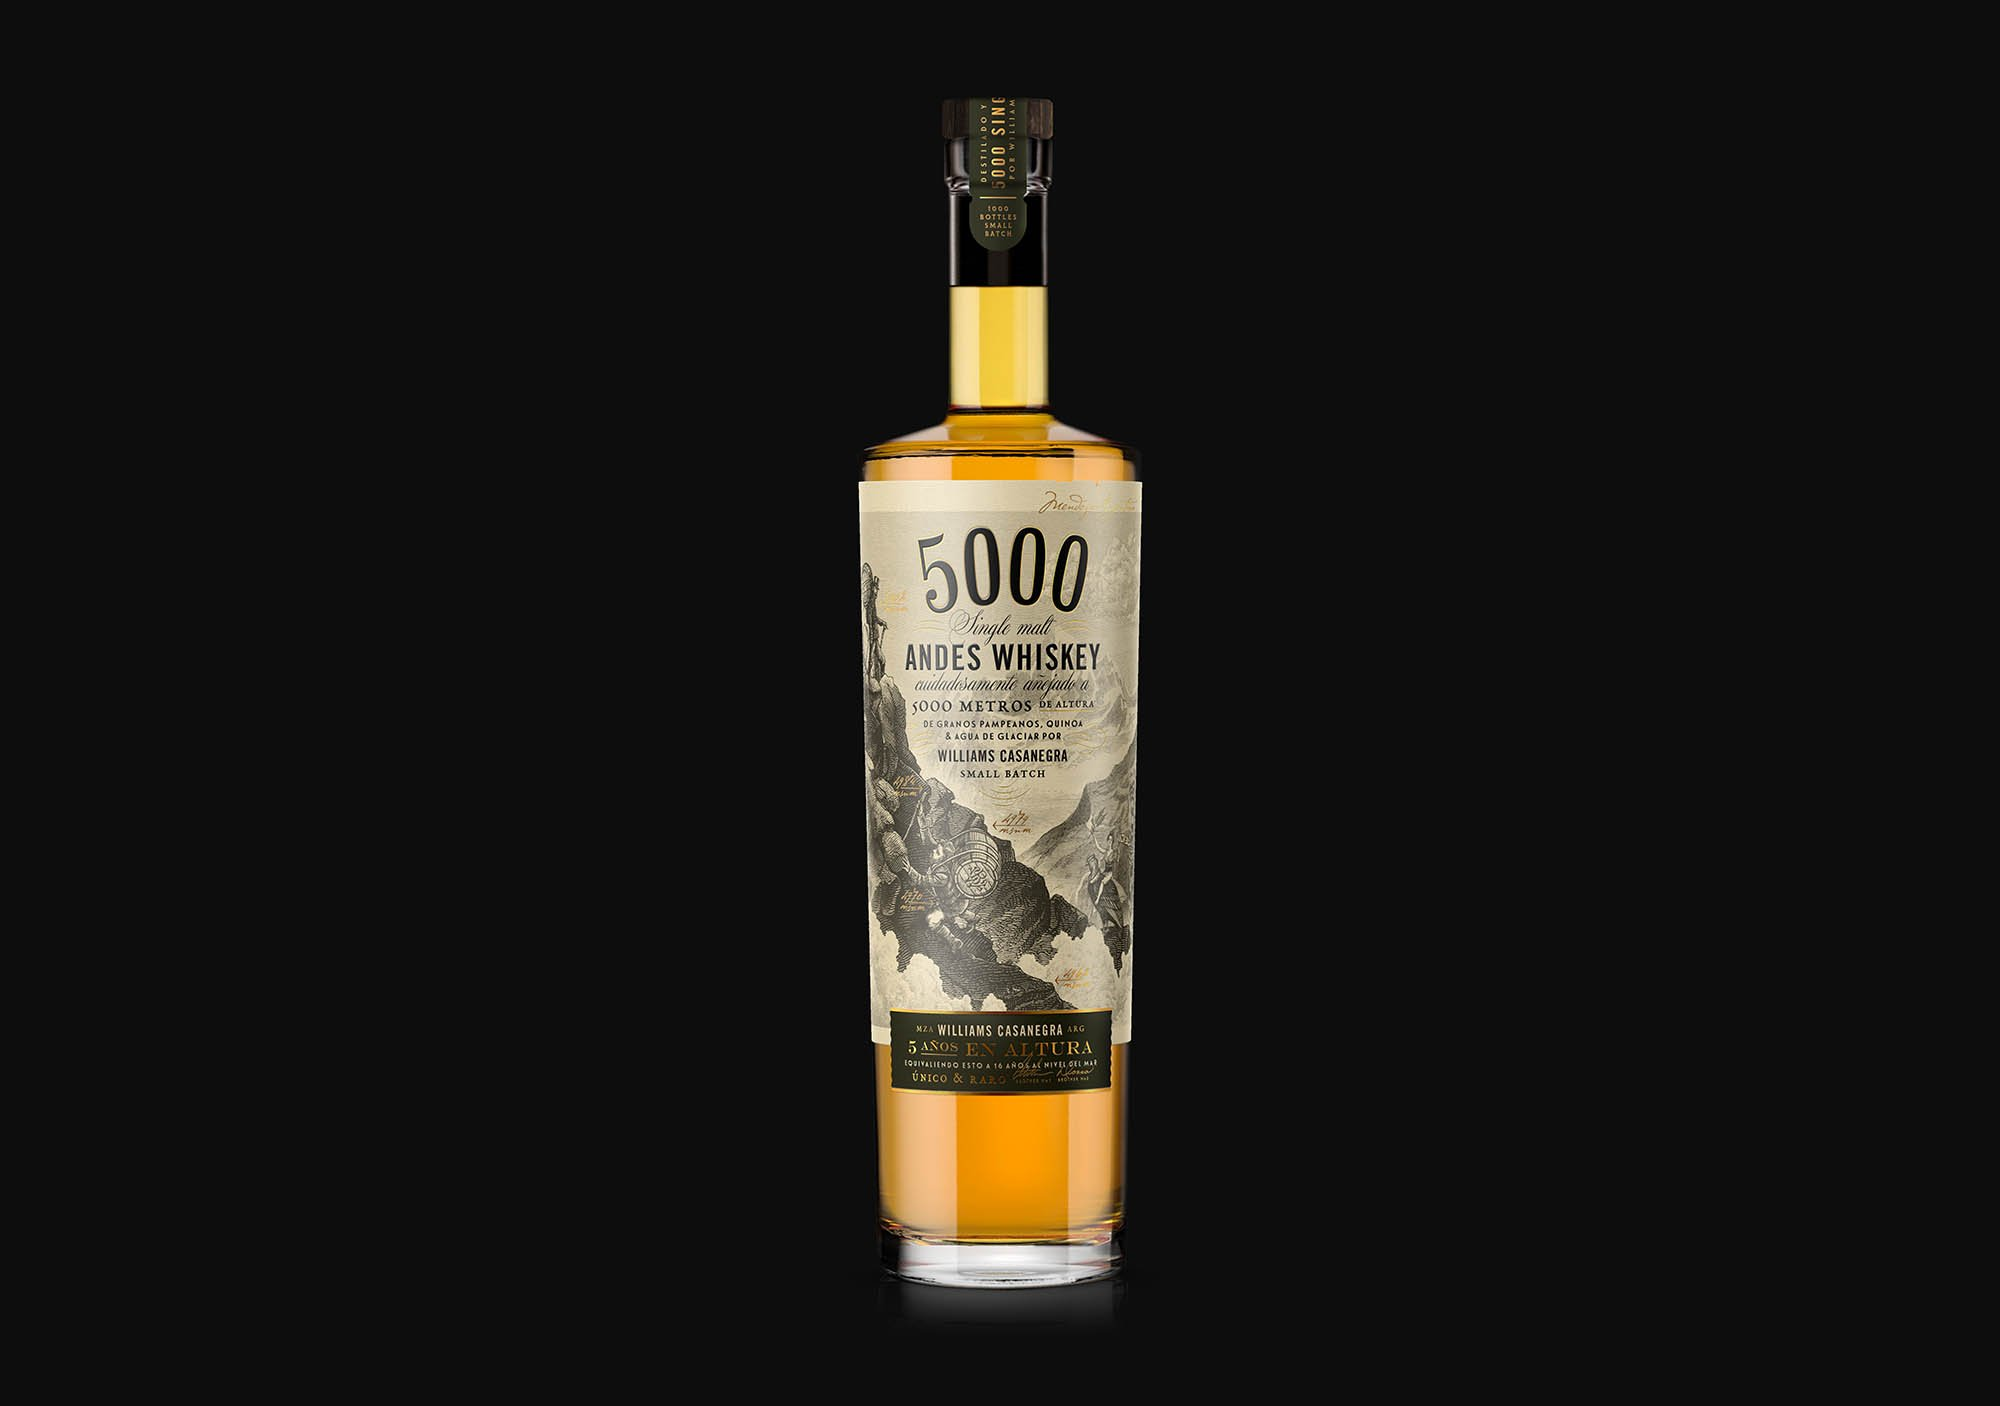 5000 oveja remi whisky